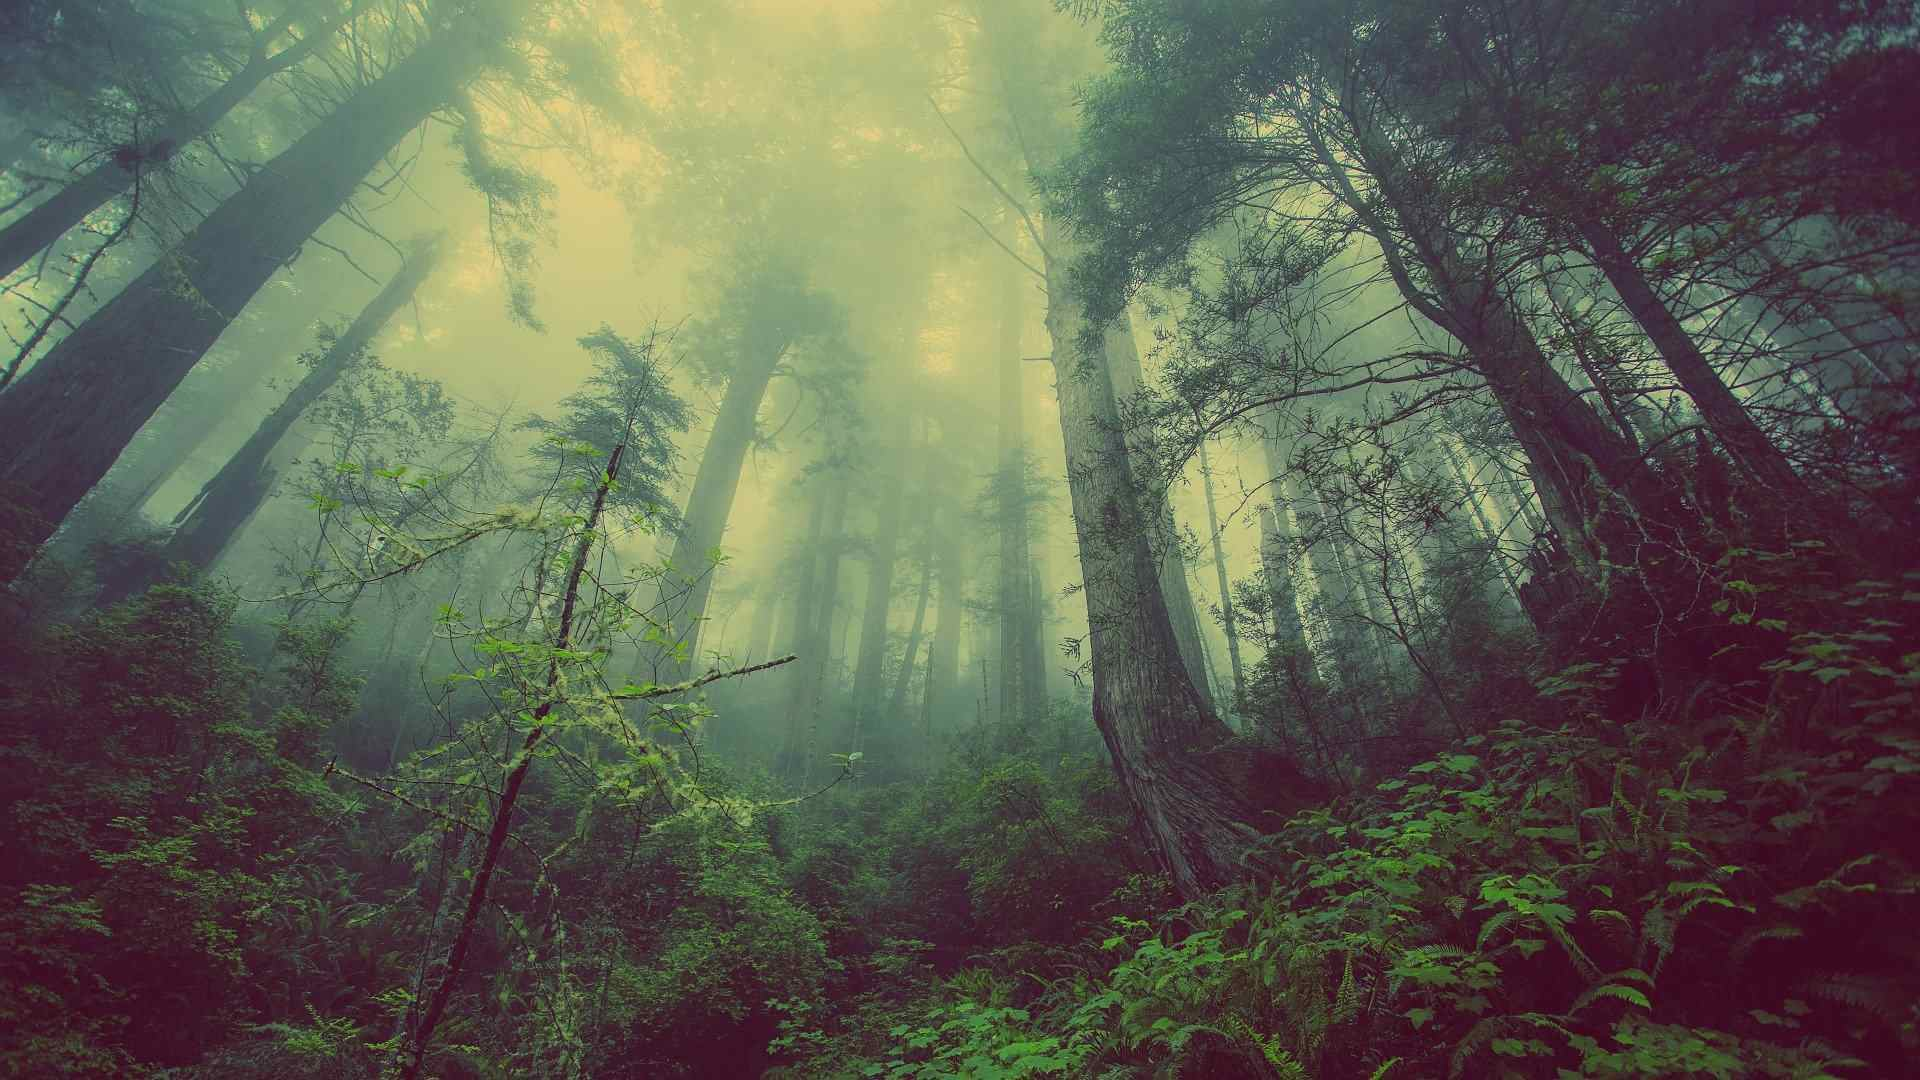 Wychwood Forest, Oxfordshire, England